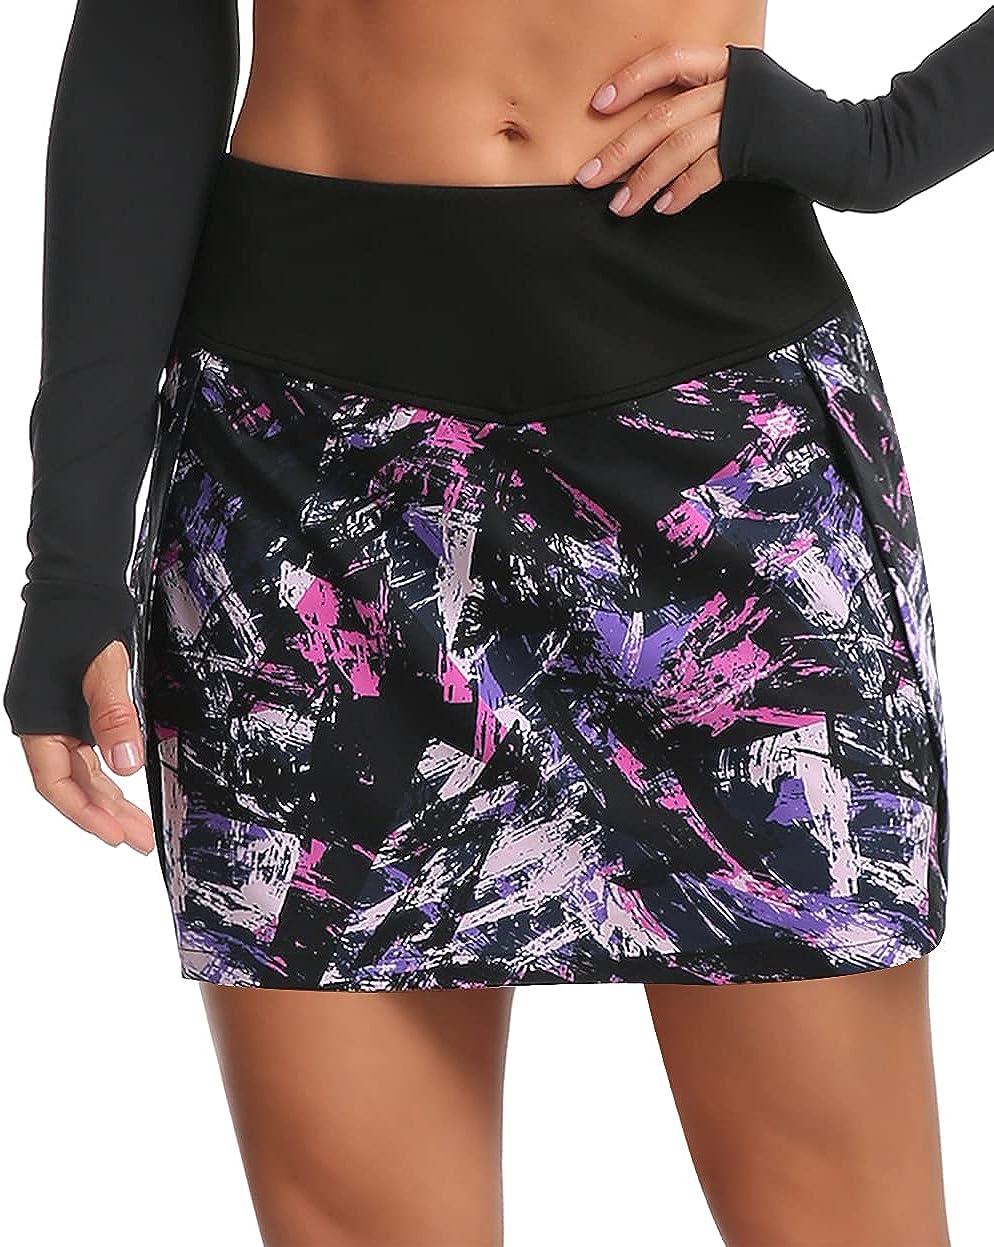 Women's Max 89% OFF Athletic Skorts Max 87% OFF Tennis Golf Shorts Running Inner Skirts